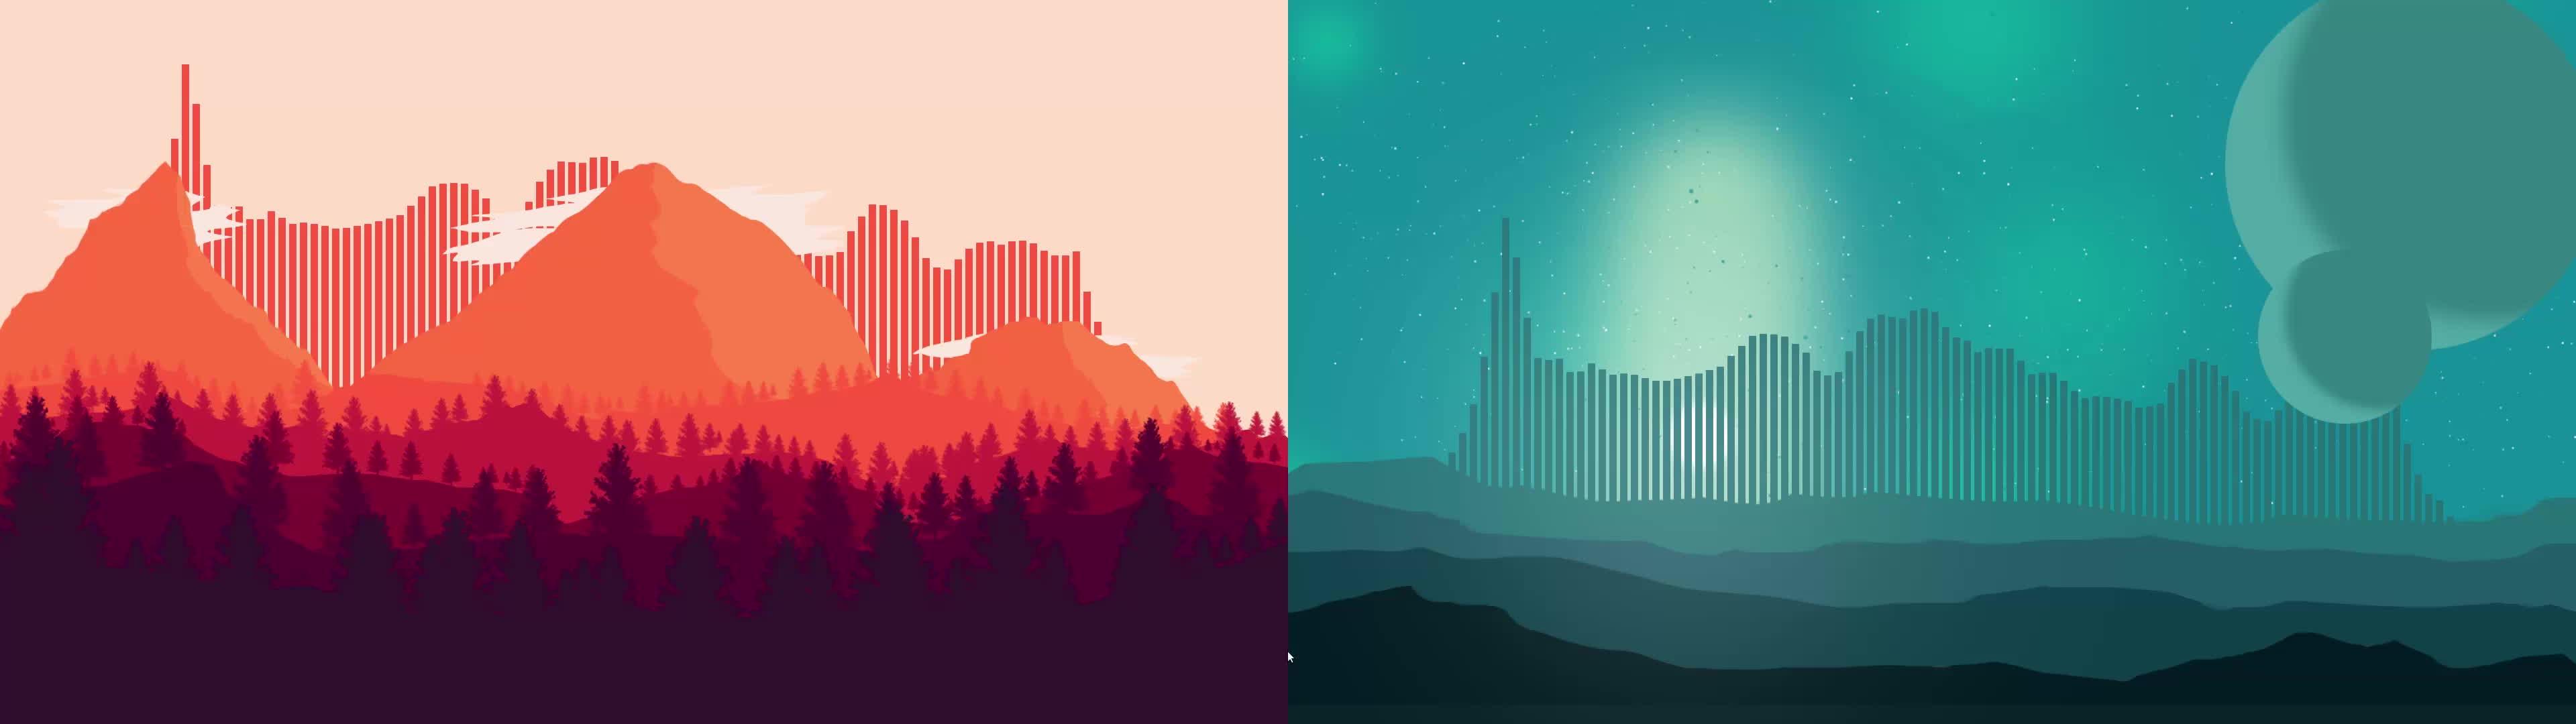 rainmeter, Firewatch+Planetary Annihilation minimalistic setup GIFs